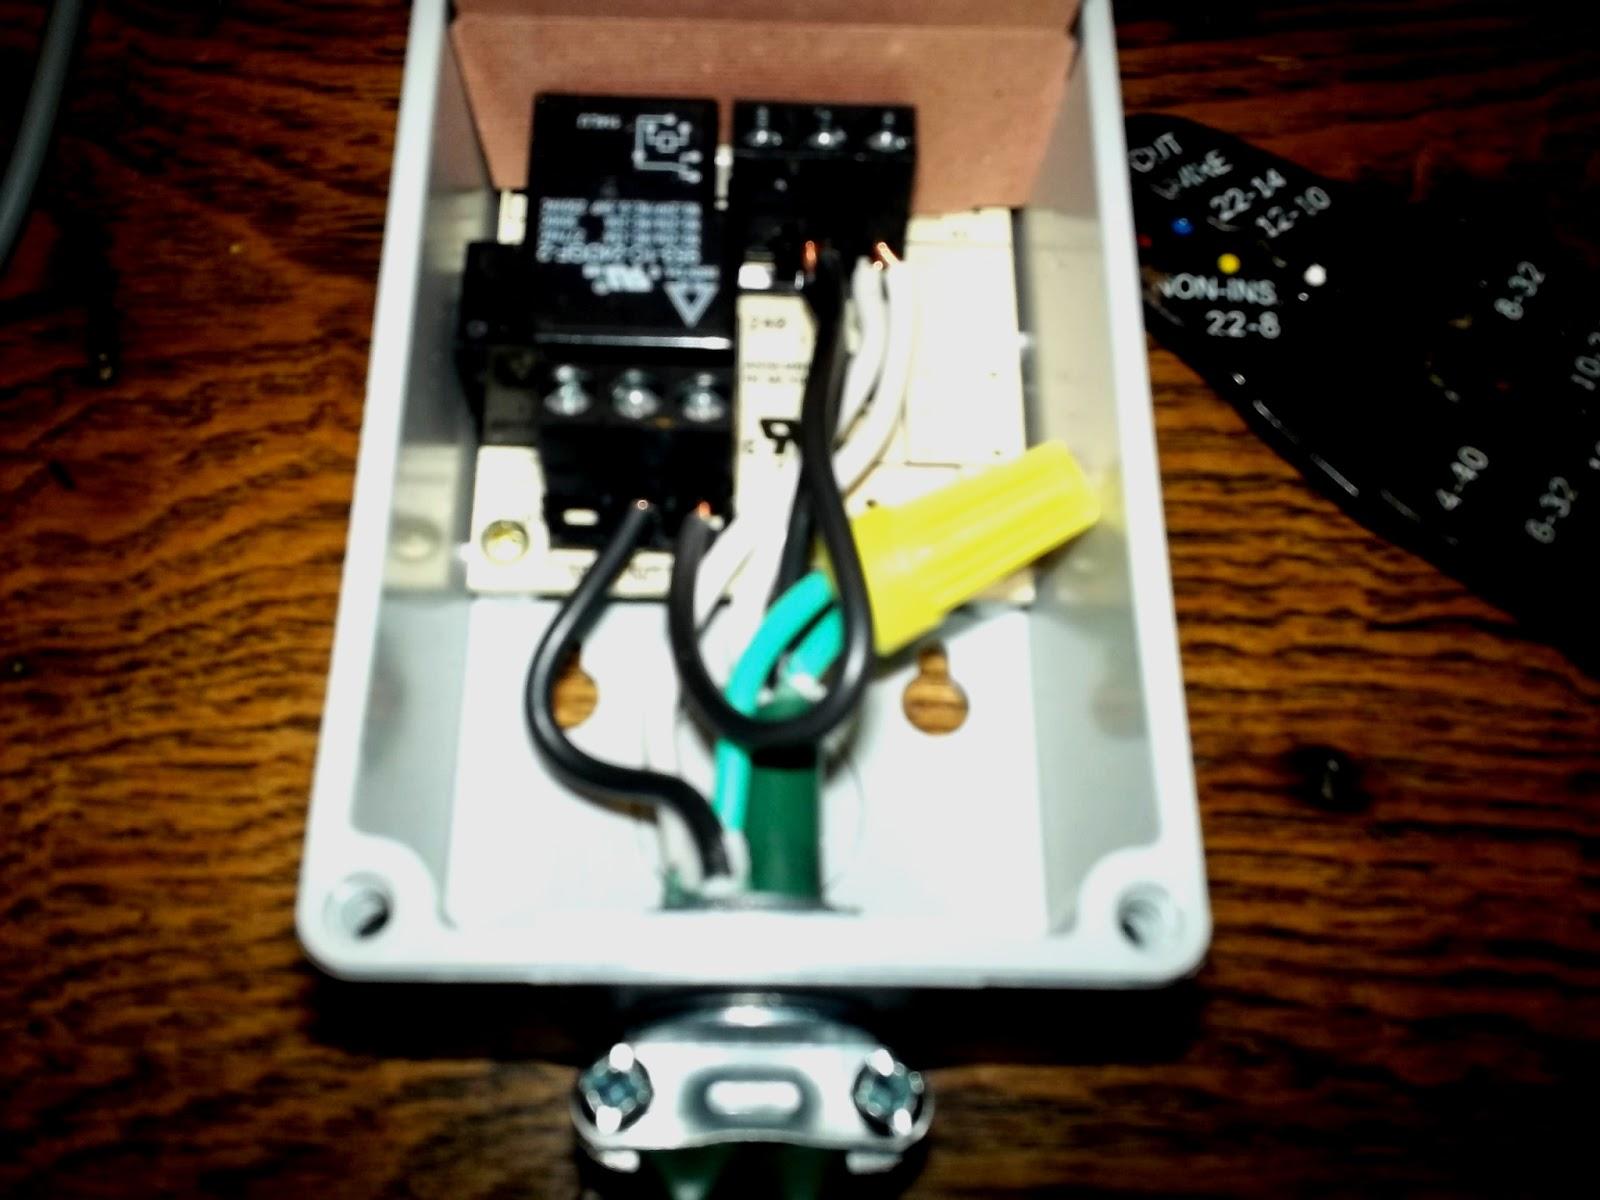 wiring ranco temperature controller library of wiring diagram u2022 rh jessascott co Ranco Parts Ranco Refrigeration